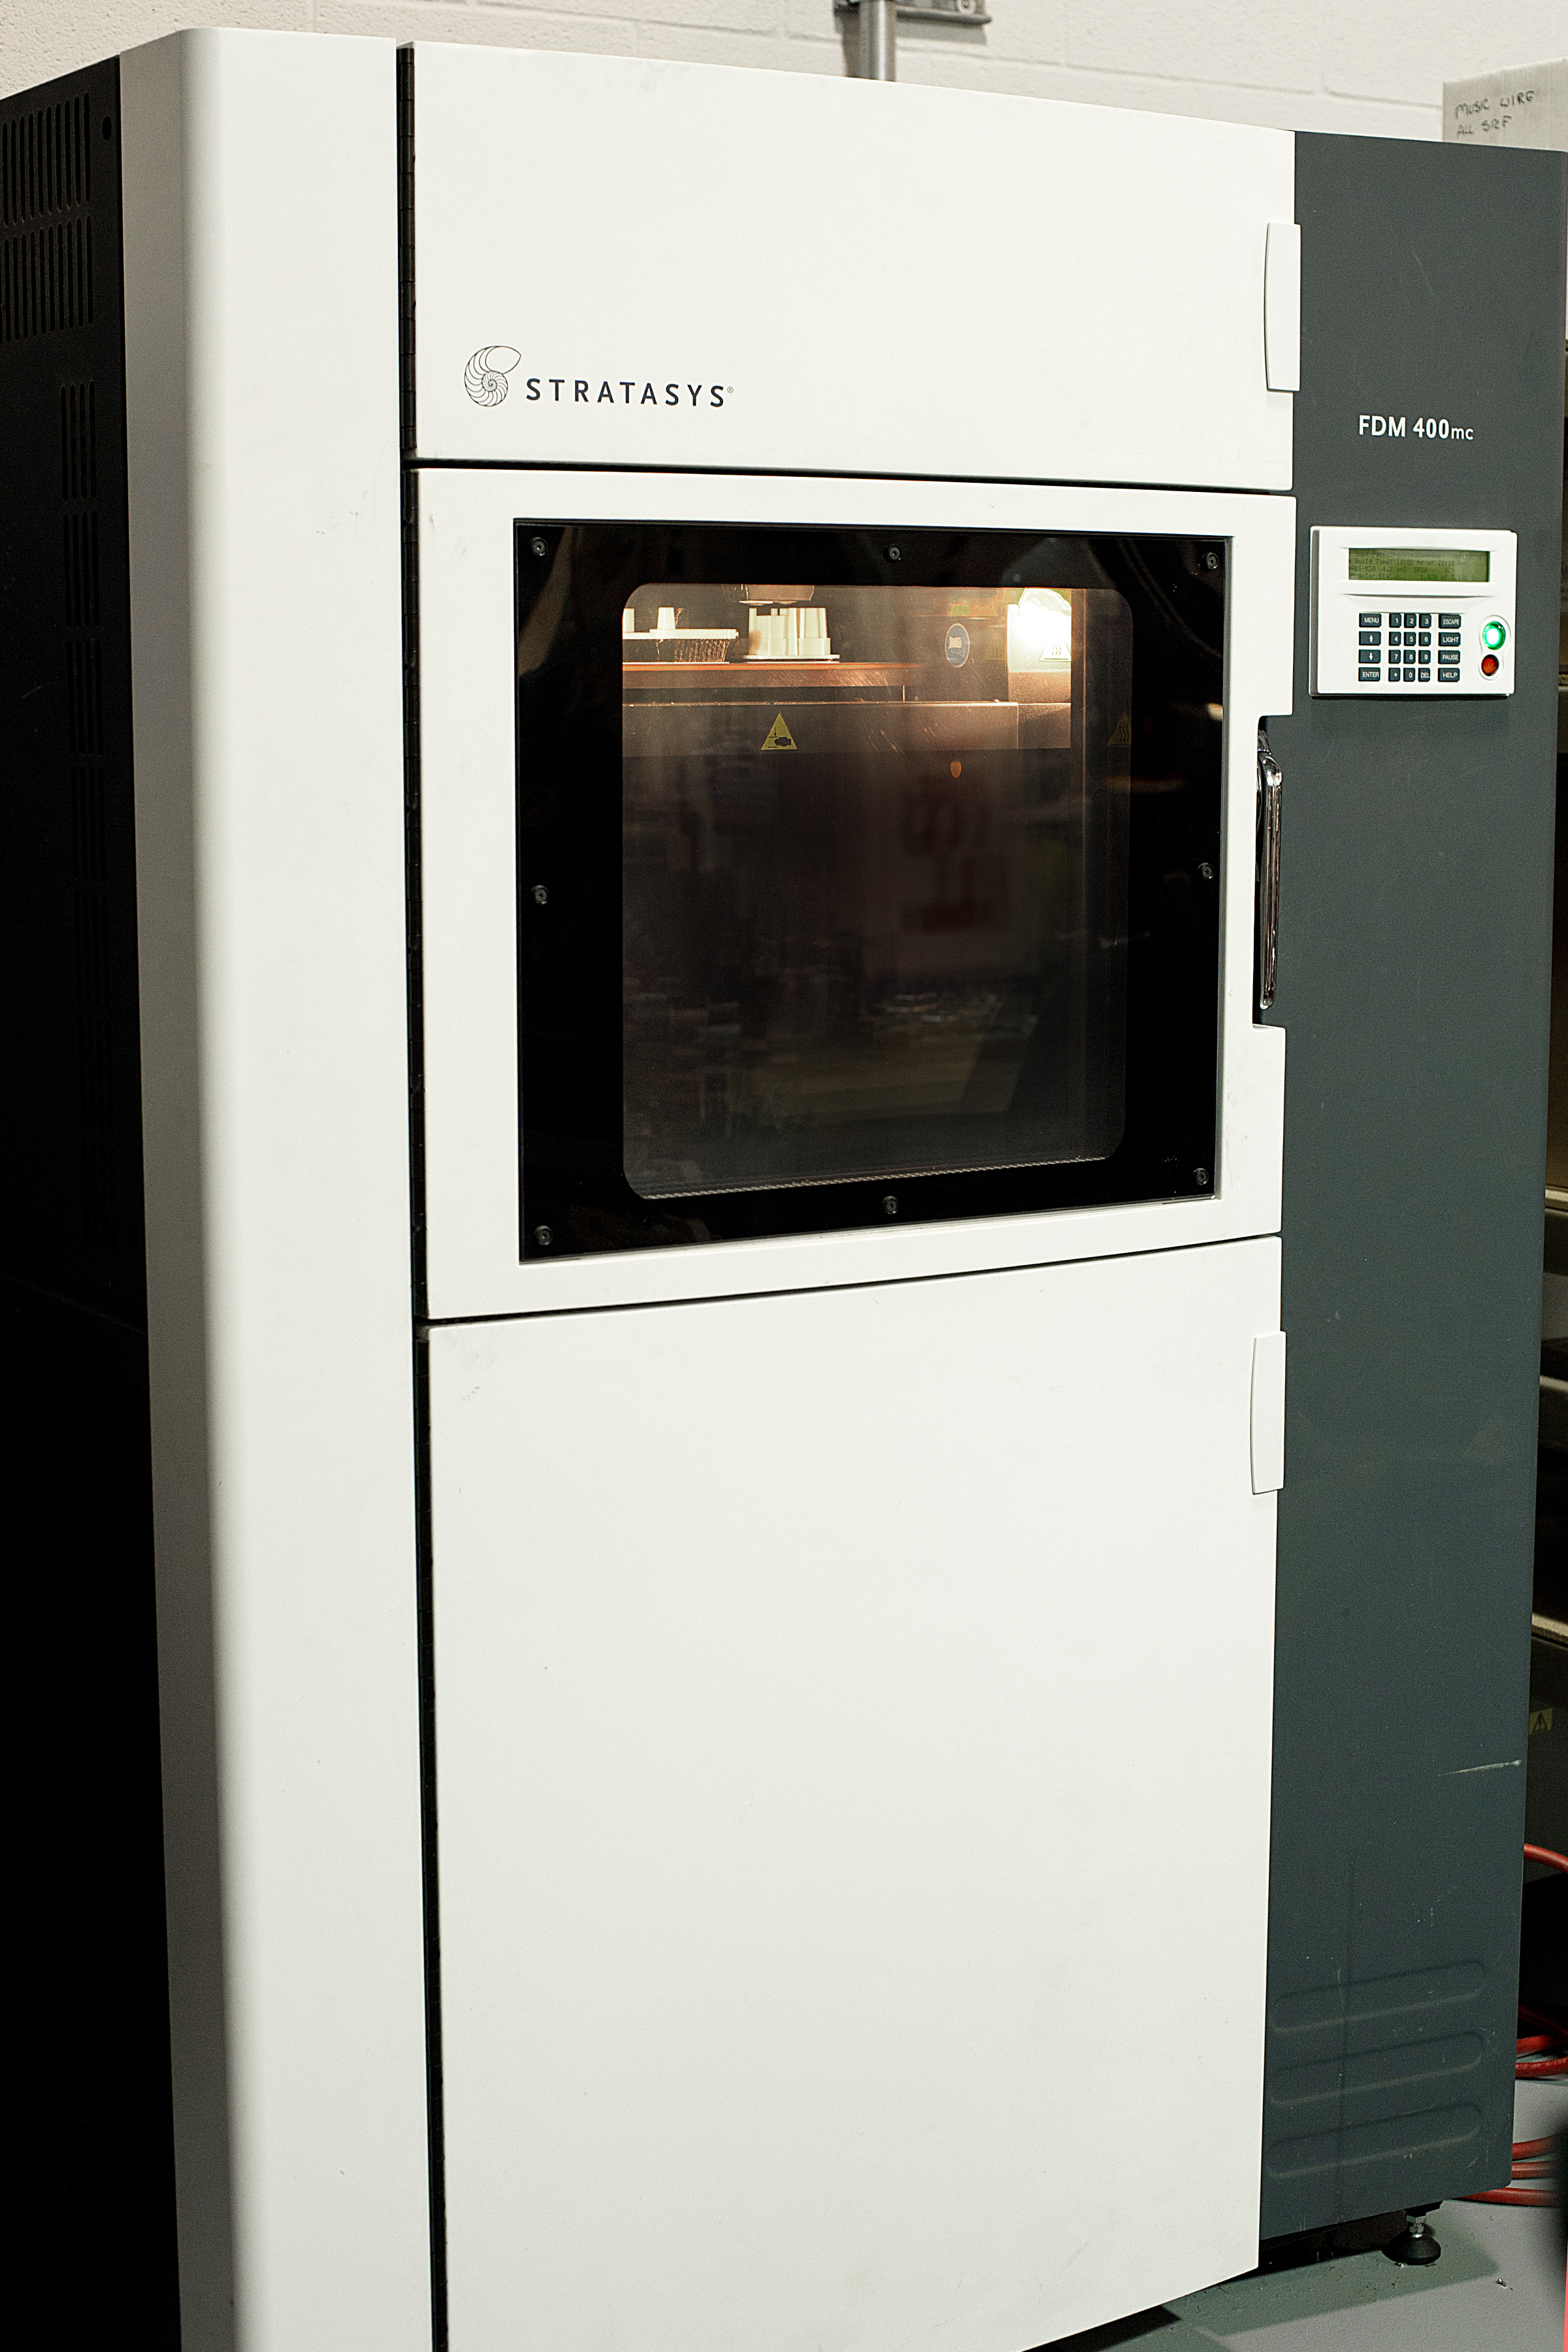 Stratasys FDM400mc machine